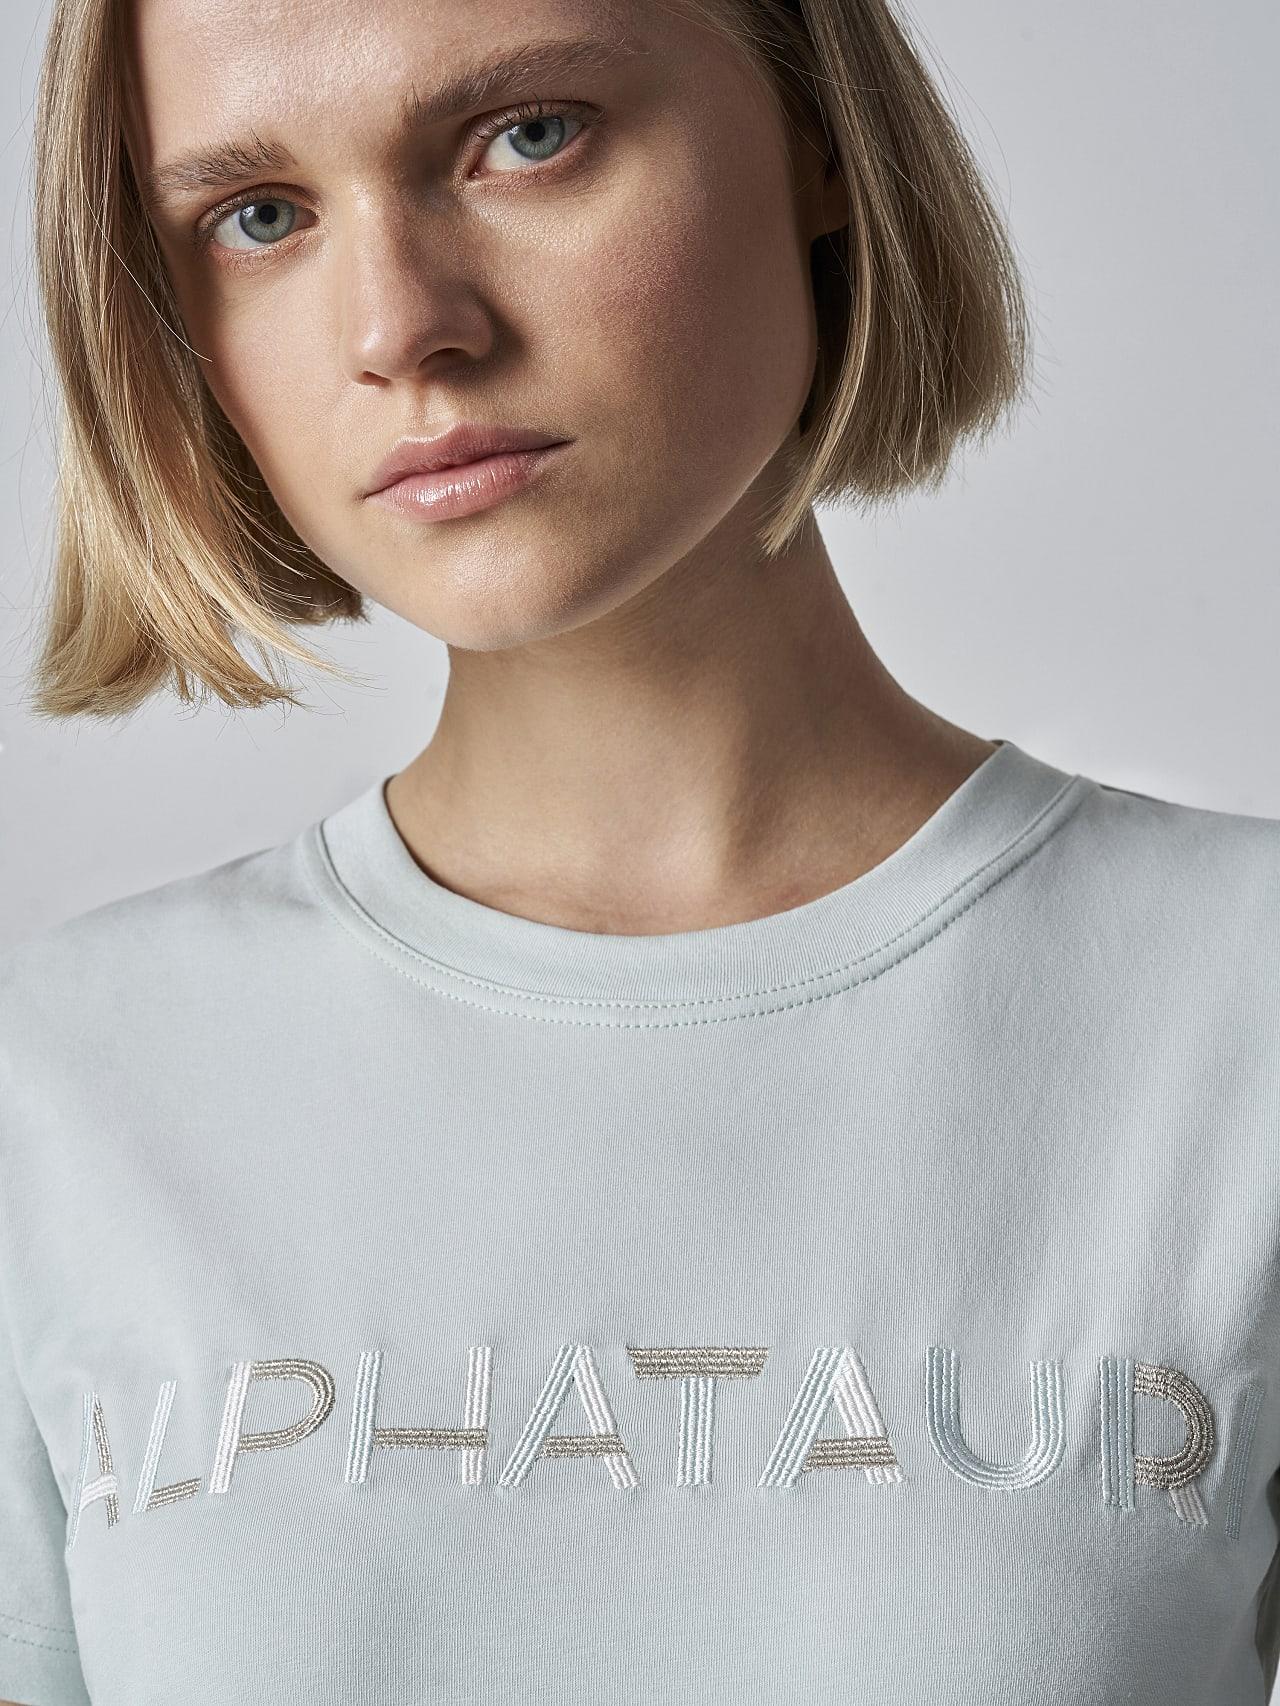 JOCTI V3.Y5.02 Logo T-Shirt Pale Blue  Right Alpha Tauri